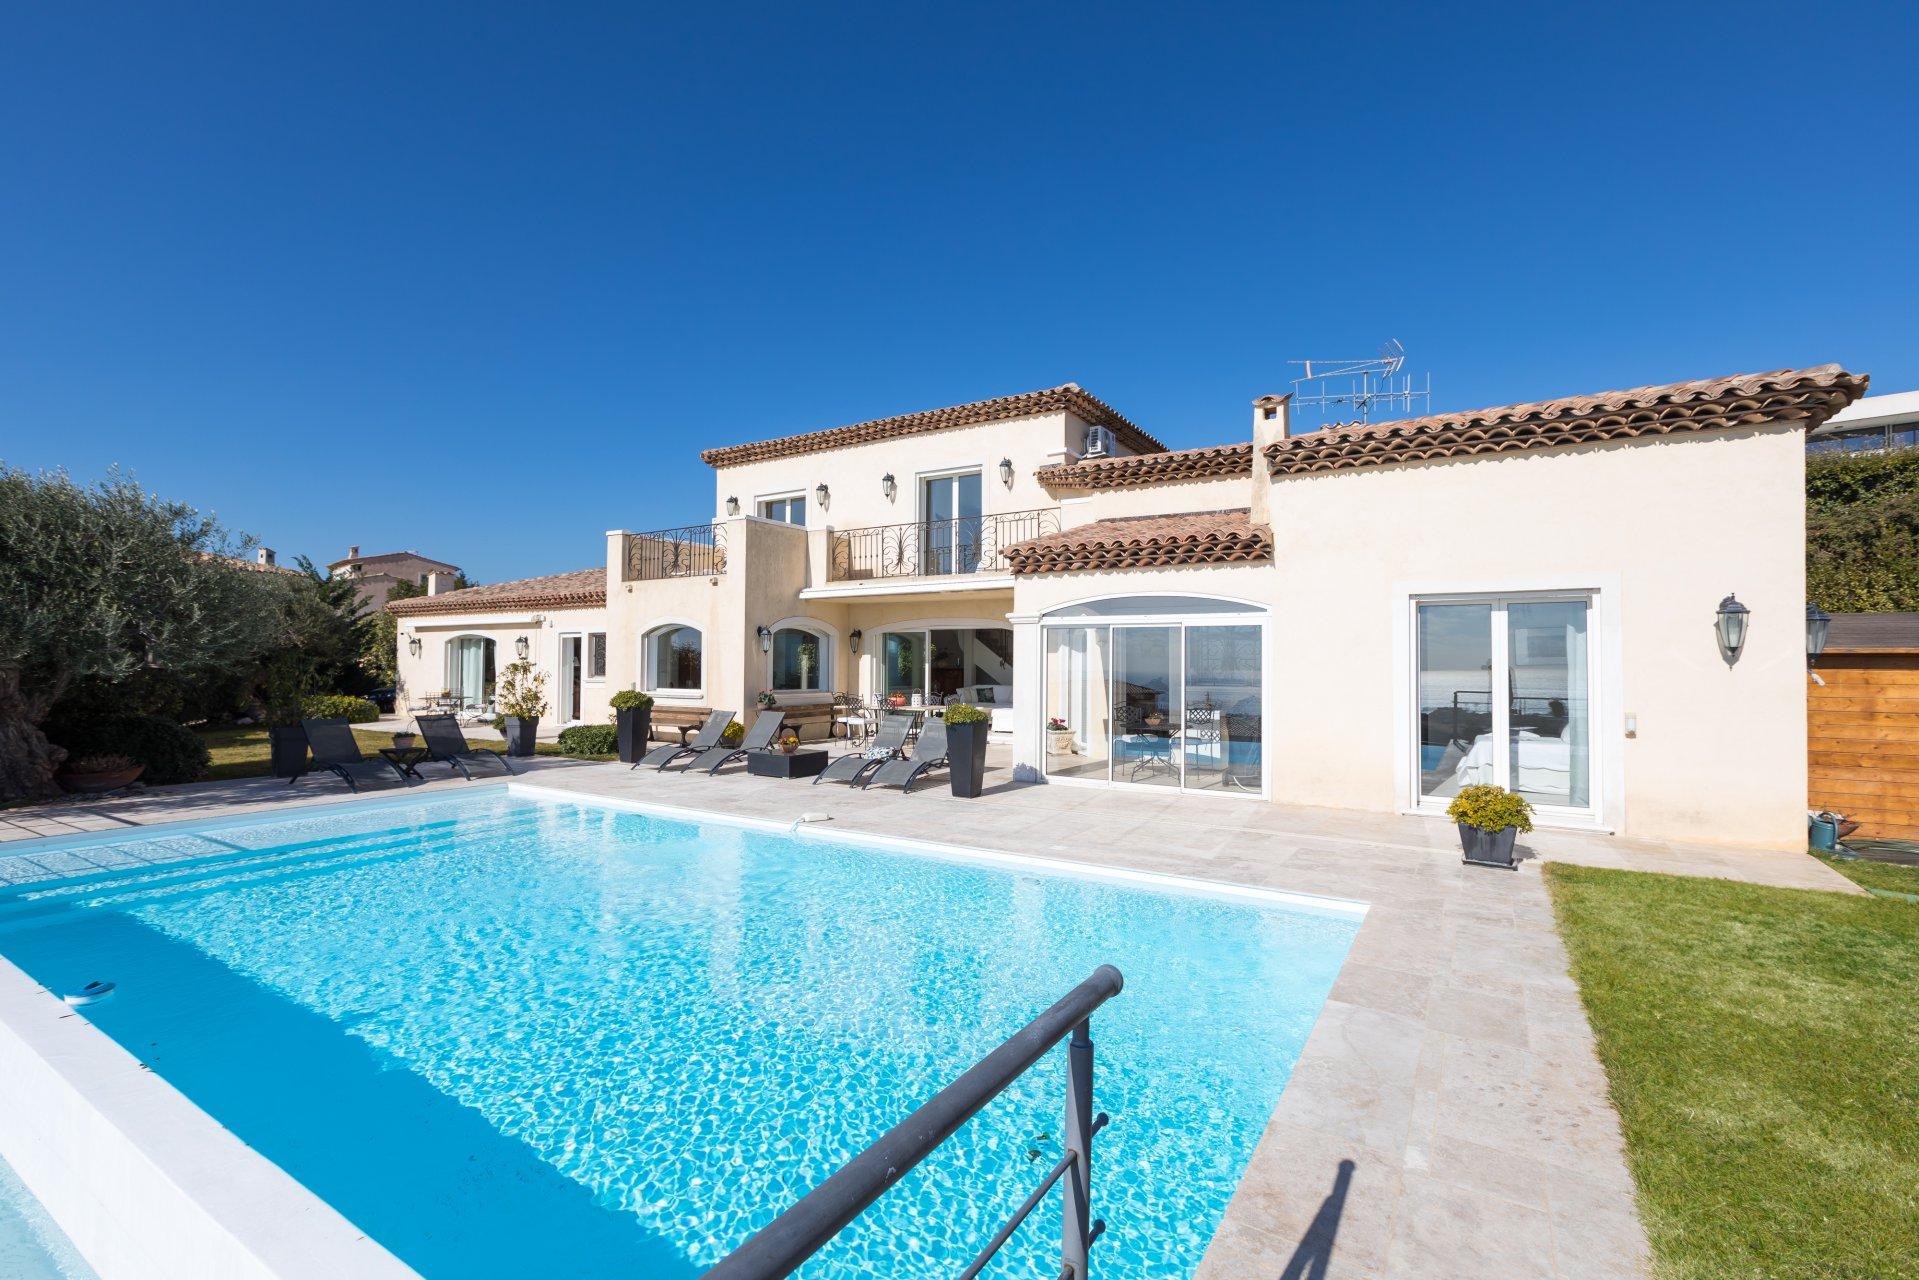 Ad Sale Property Cagnes-sur-Mer (06800), 9 Rooms ref:V2165CO